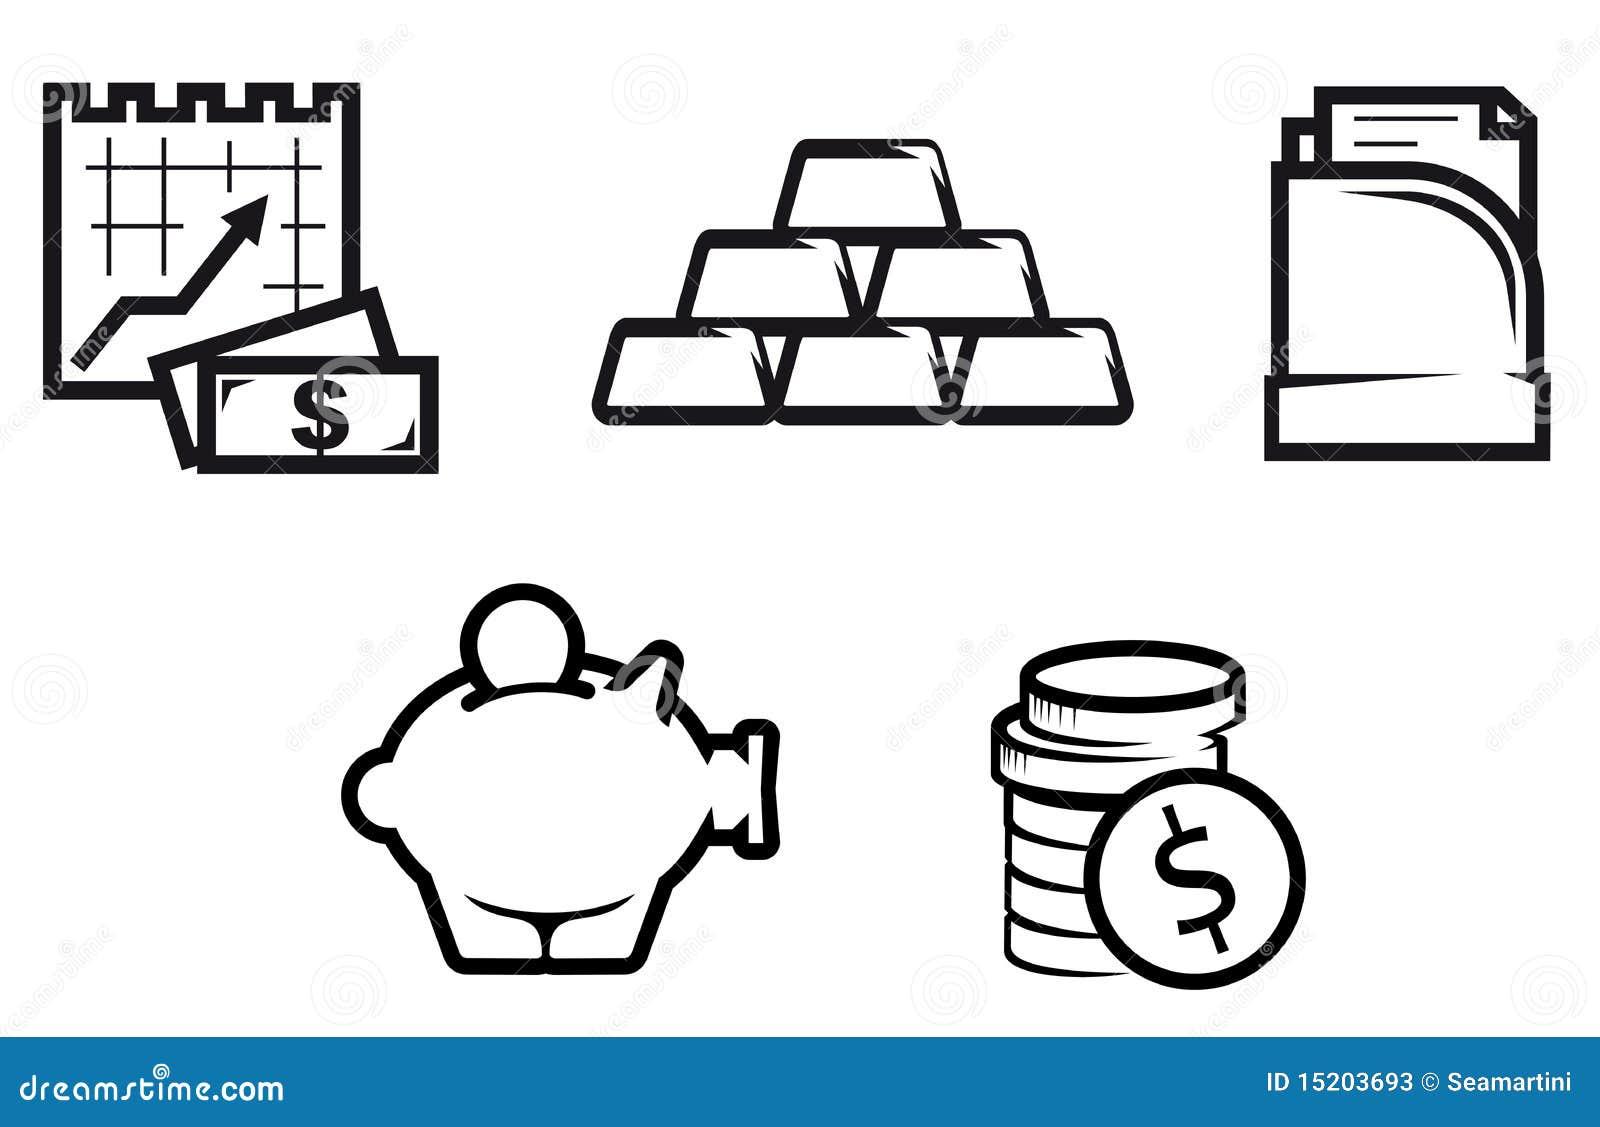 finance and economics symbols stock photos